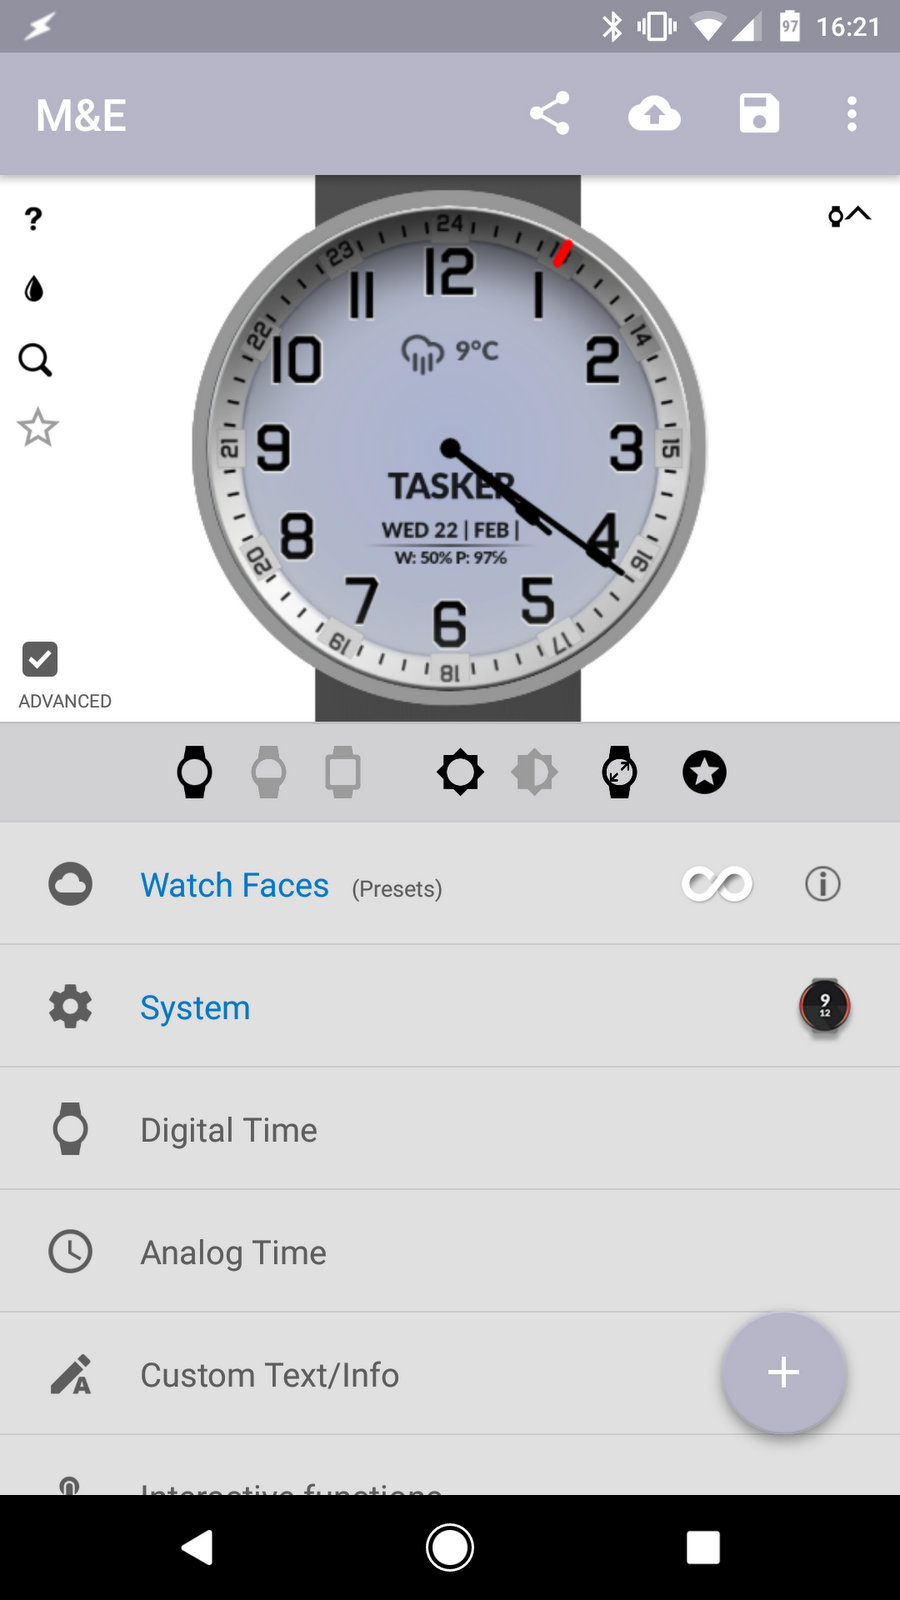 Watch Face - Minimal & Elegant (with Tasker integration) - Not